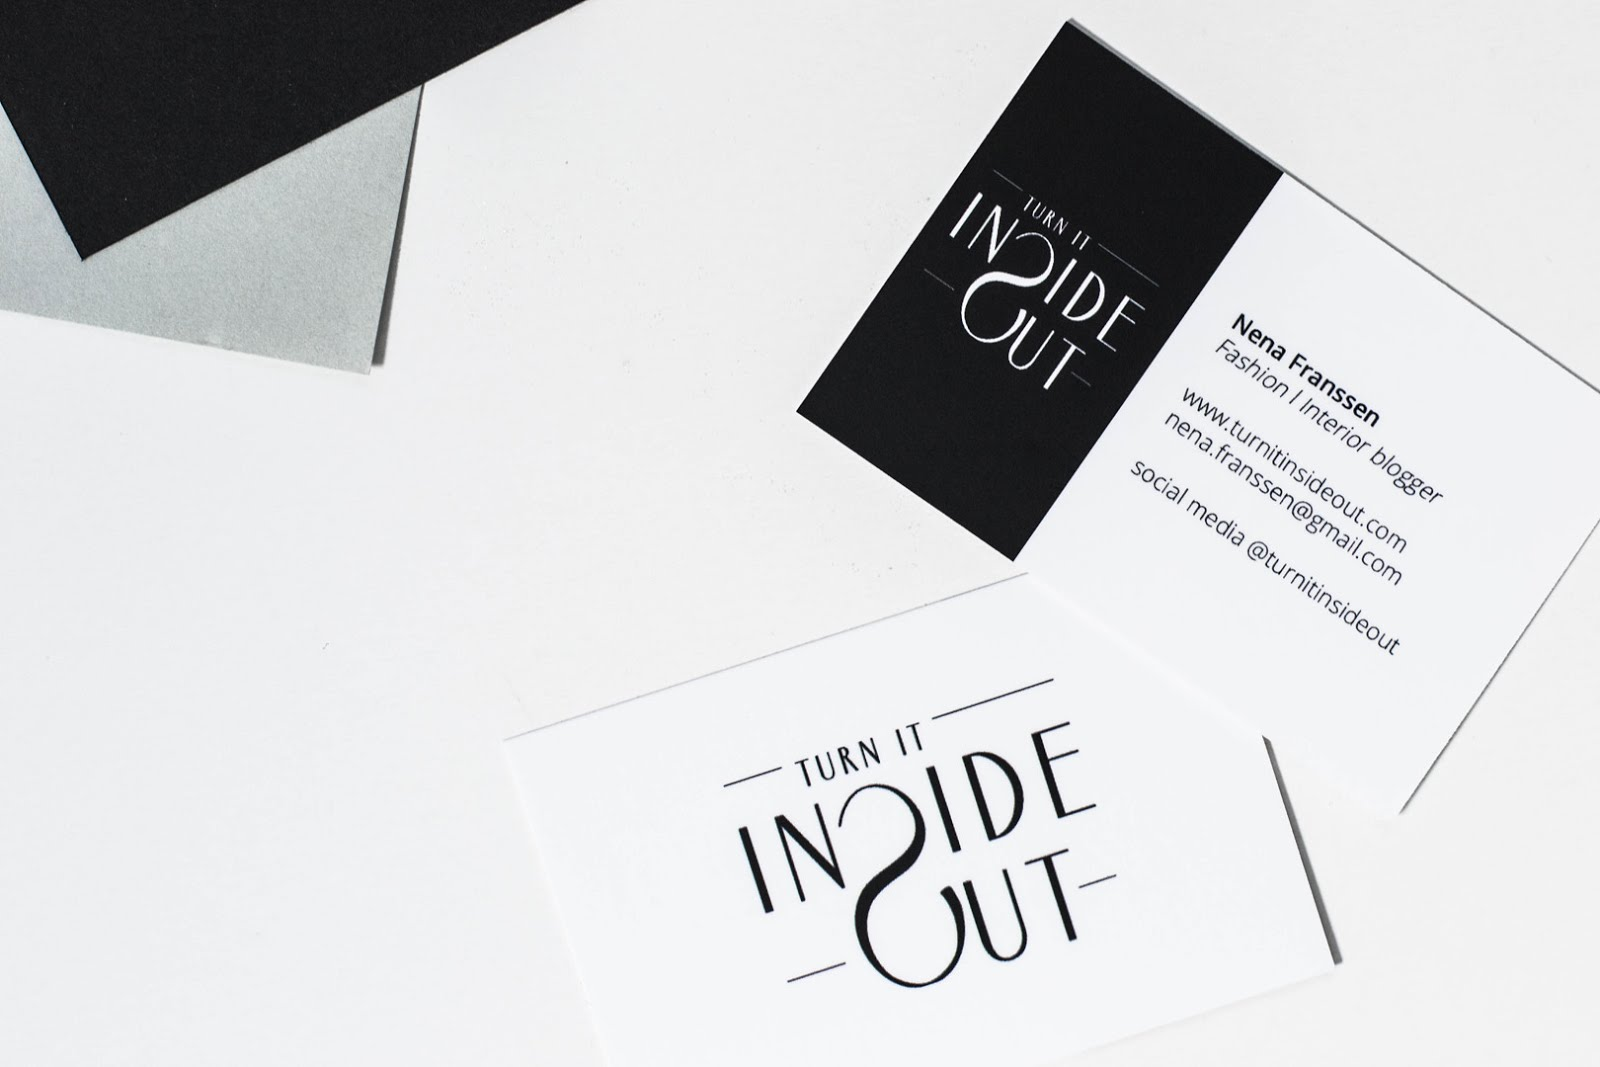 Moo, business cards, minimal, interior blogger, fashion blogger, black and white, logo design, flat lay